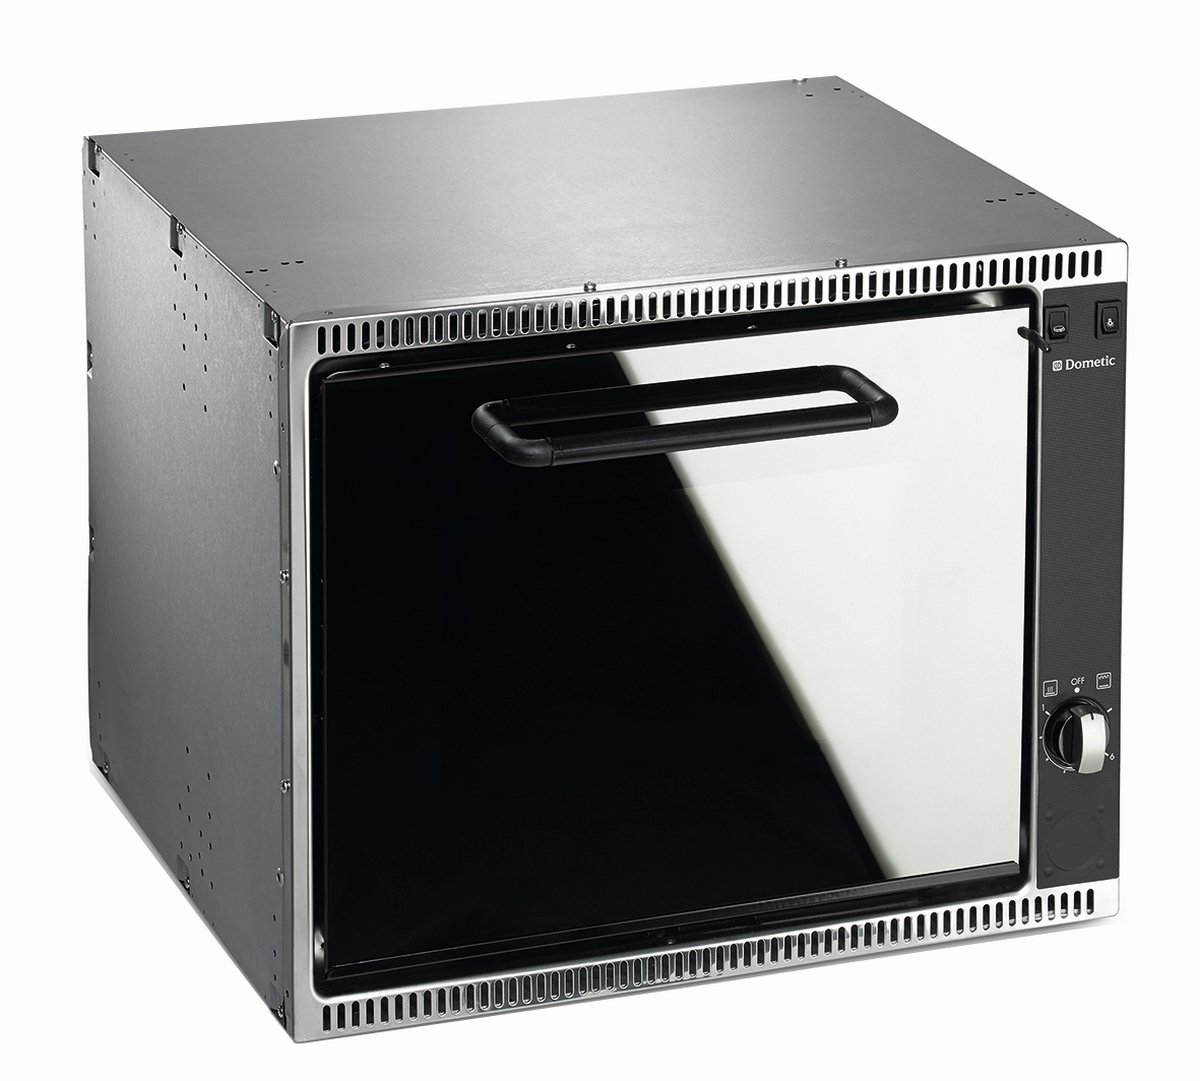 Dometic Einbau-Backofen OG 3000